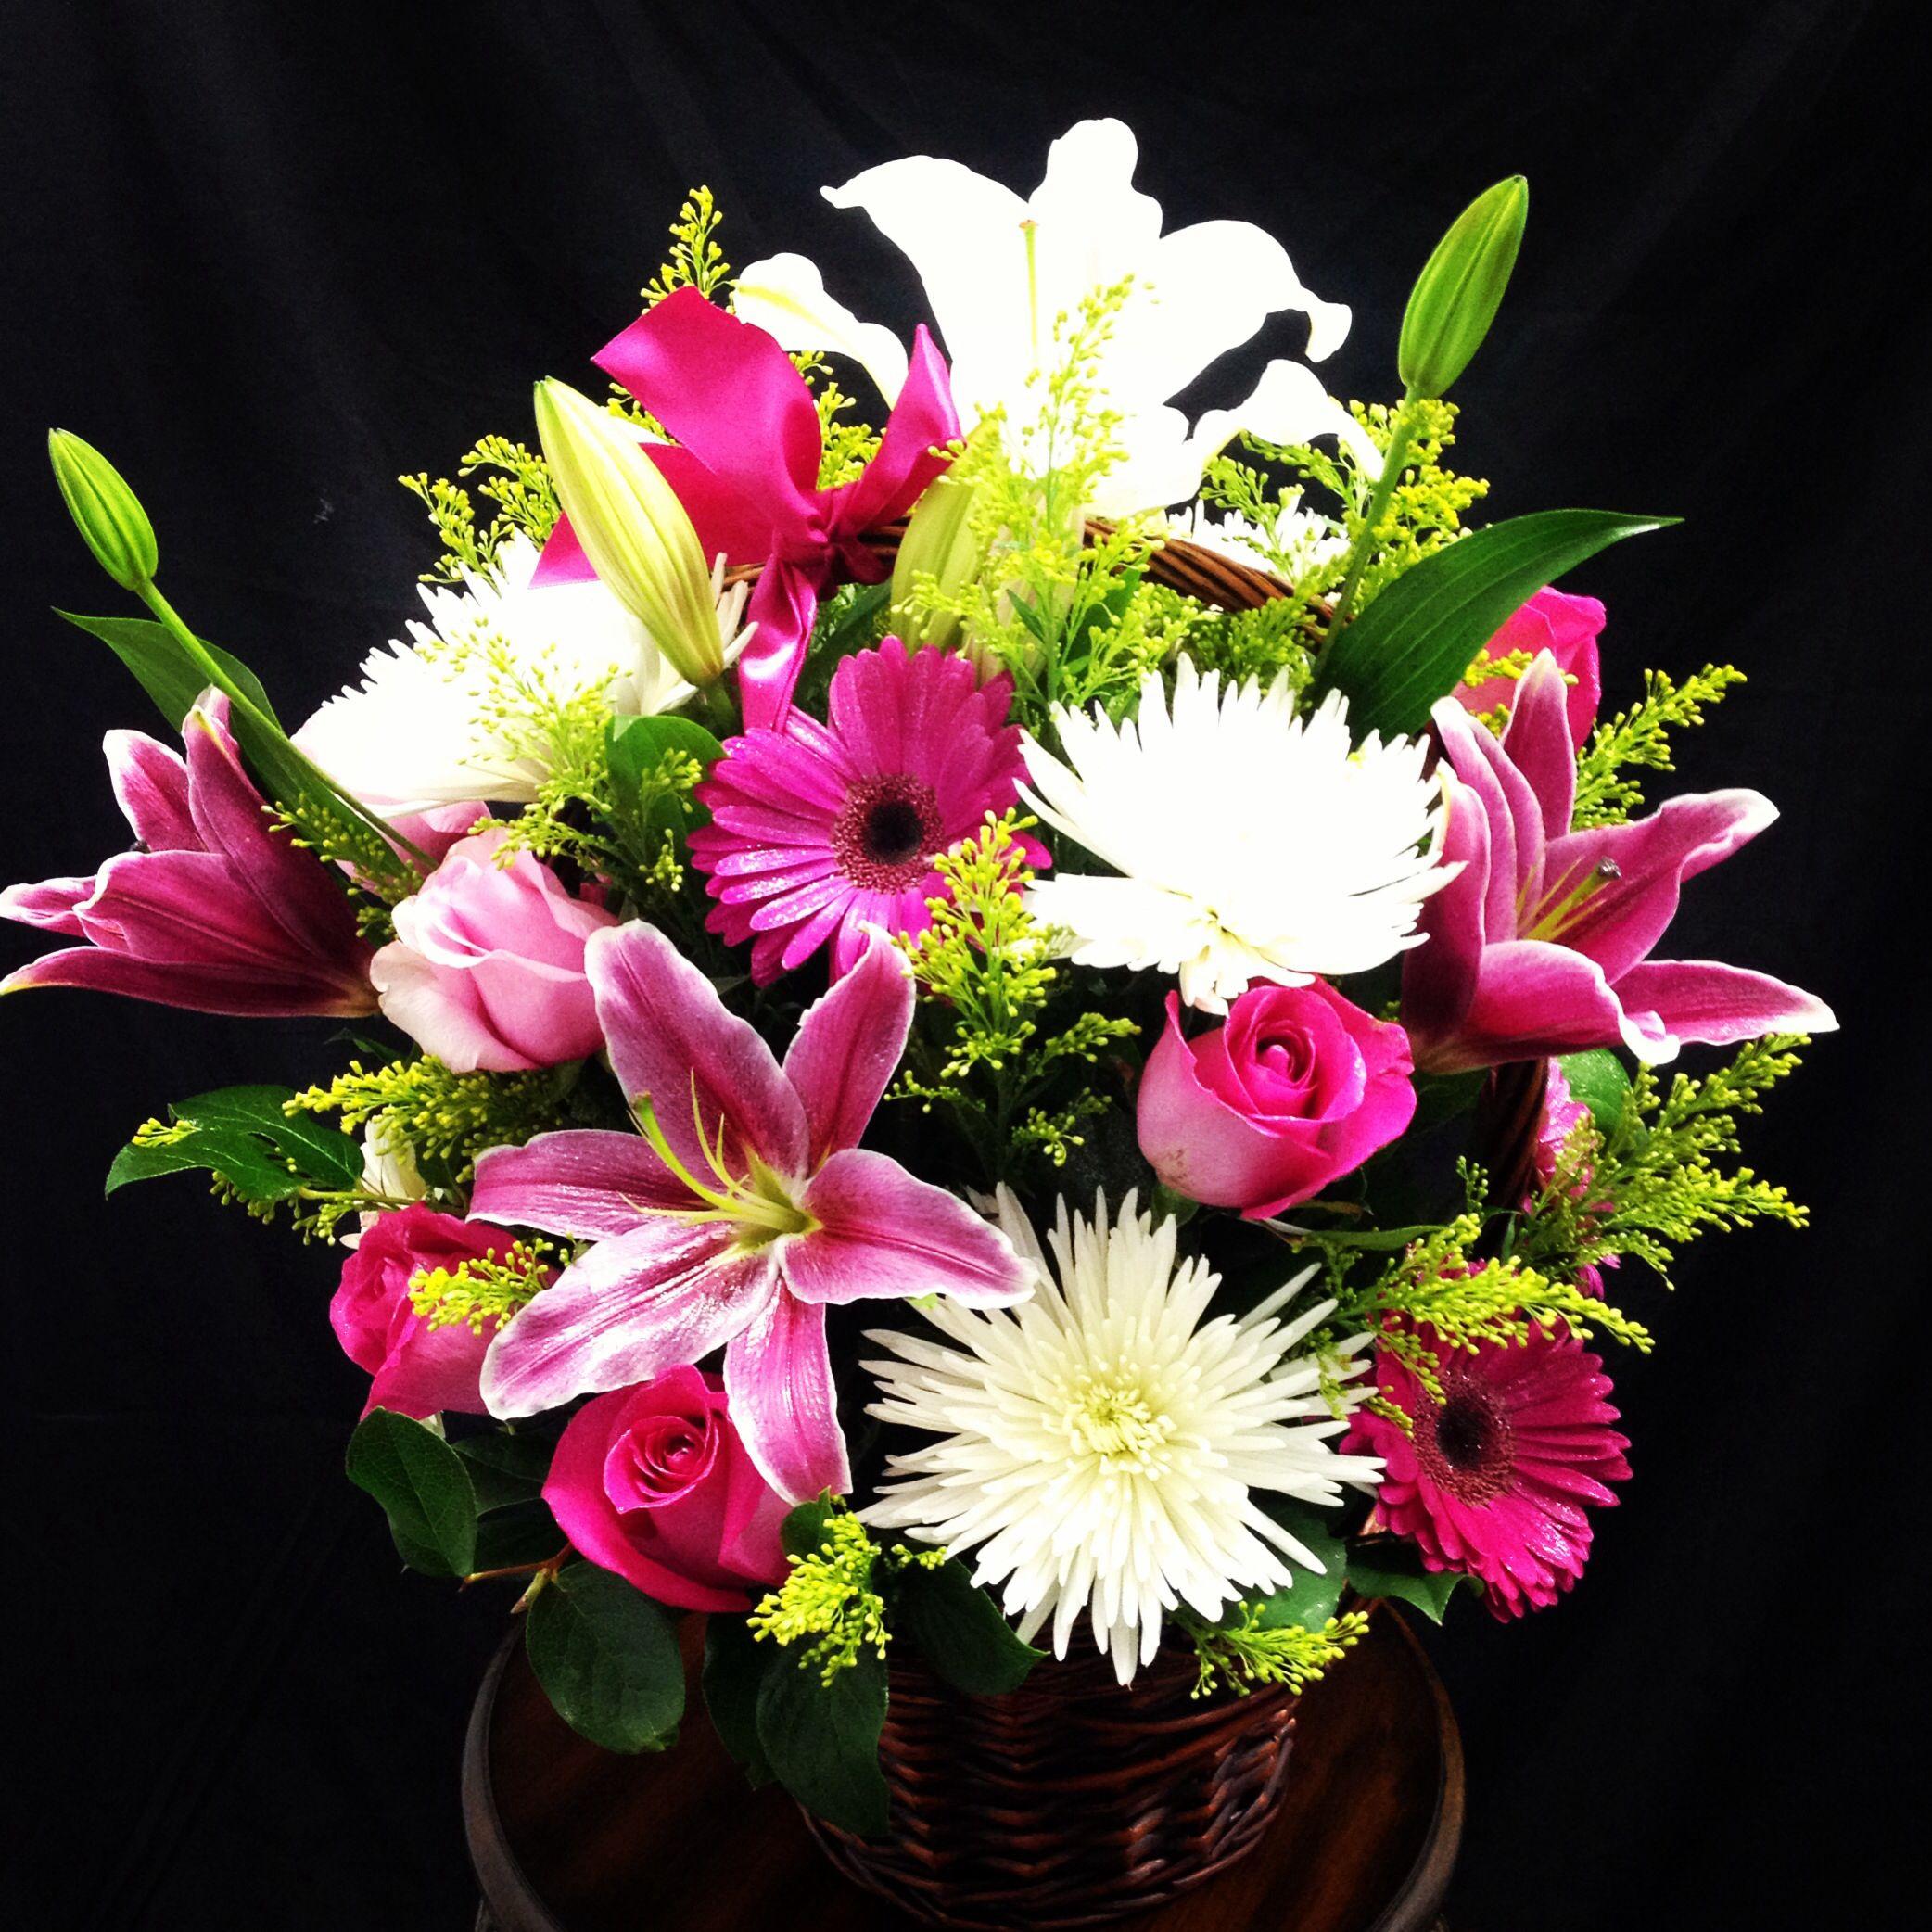 Beautiful flower basket visit us at gardenofroses beautiful flower basket visit us at gardenofroses ieflorist florist izmirmasajfo